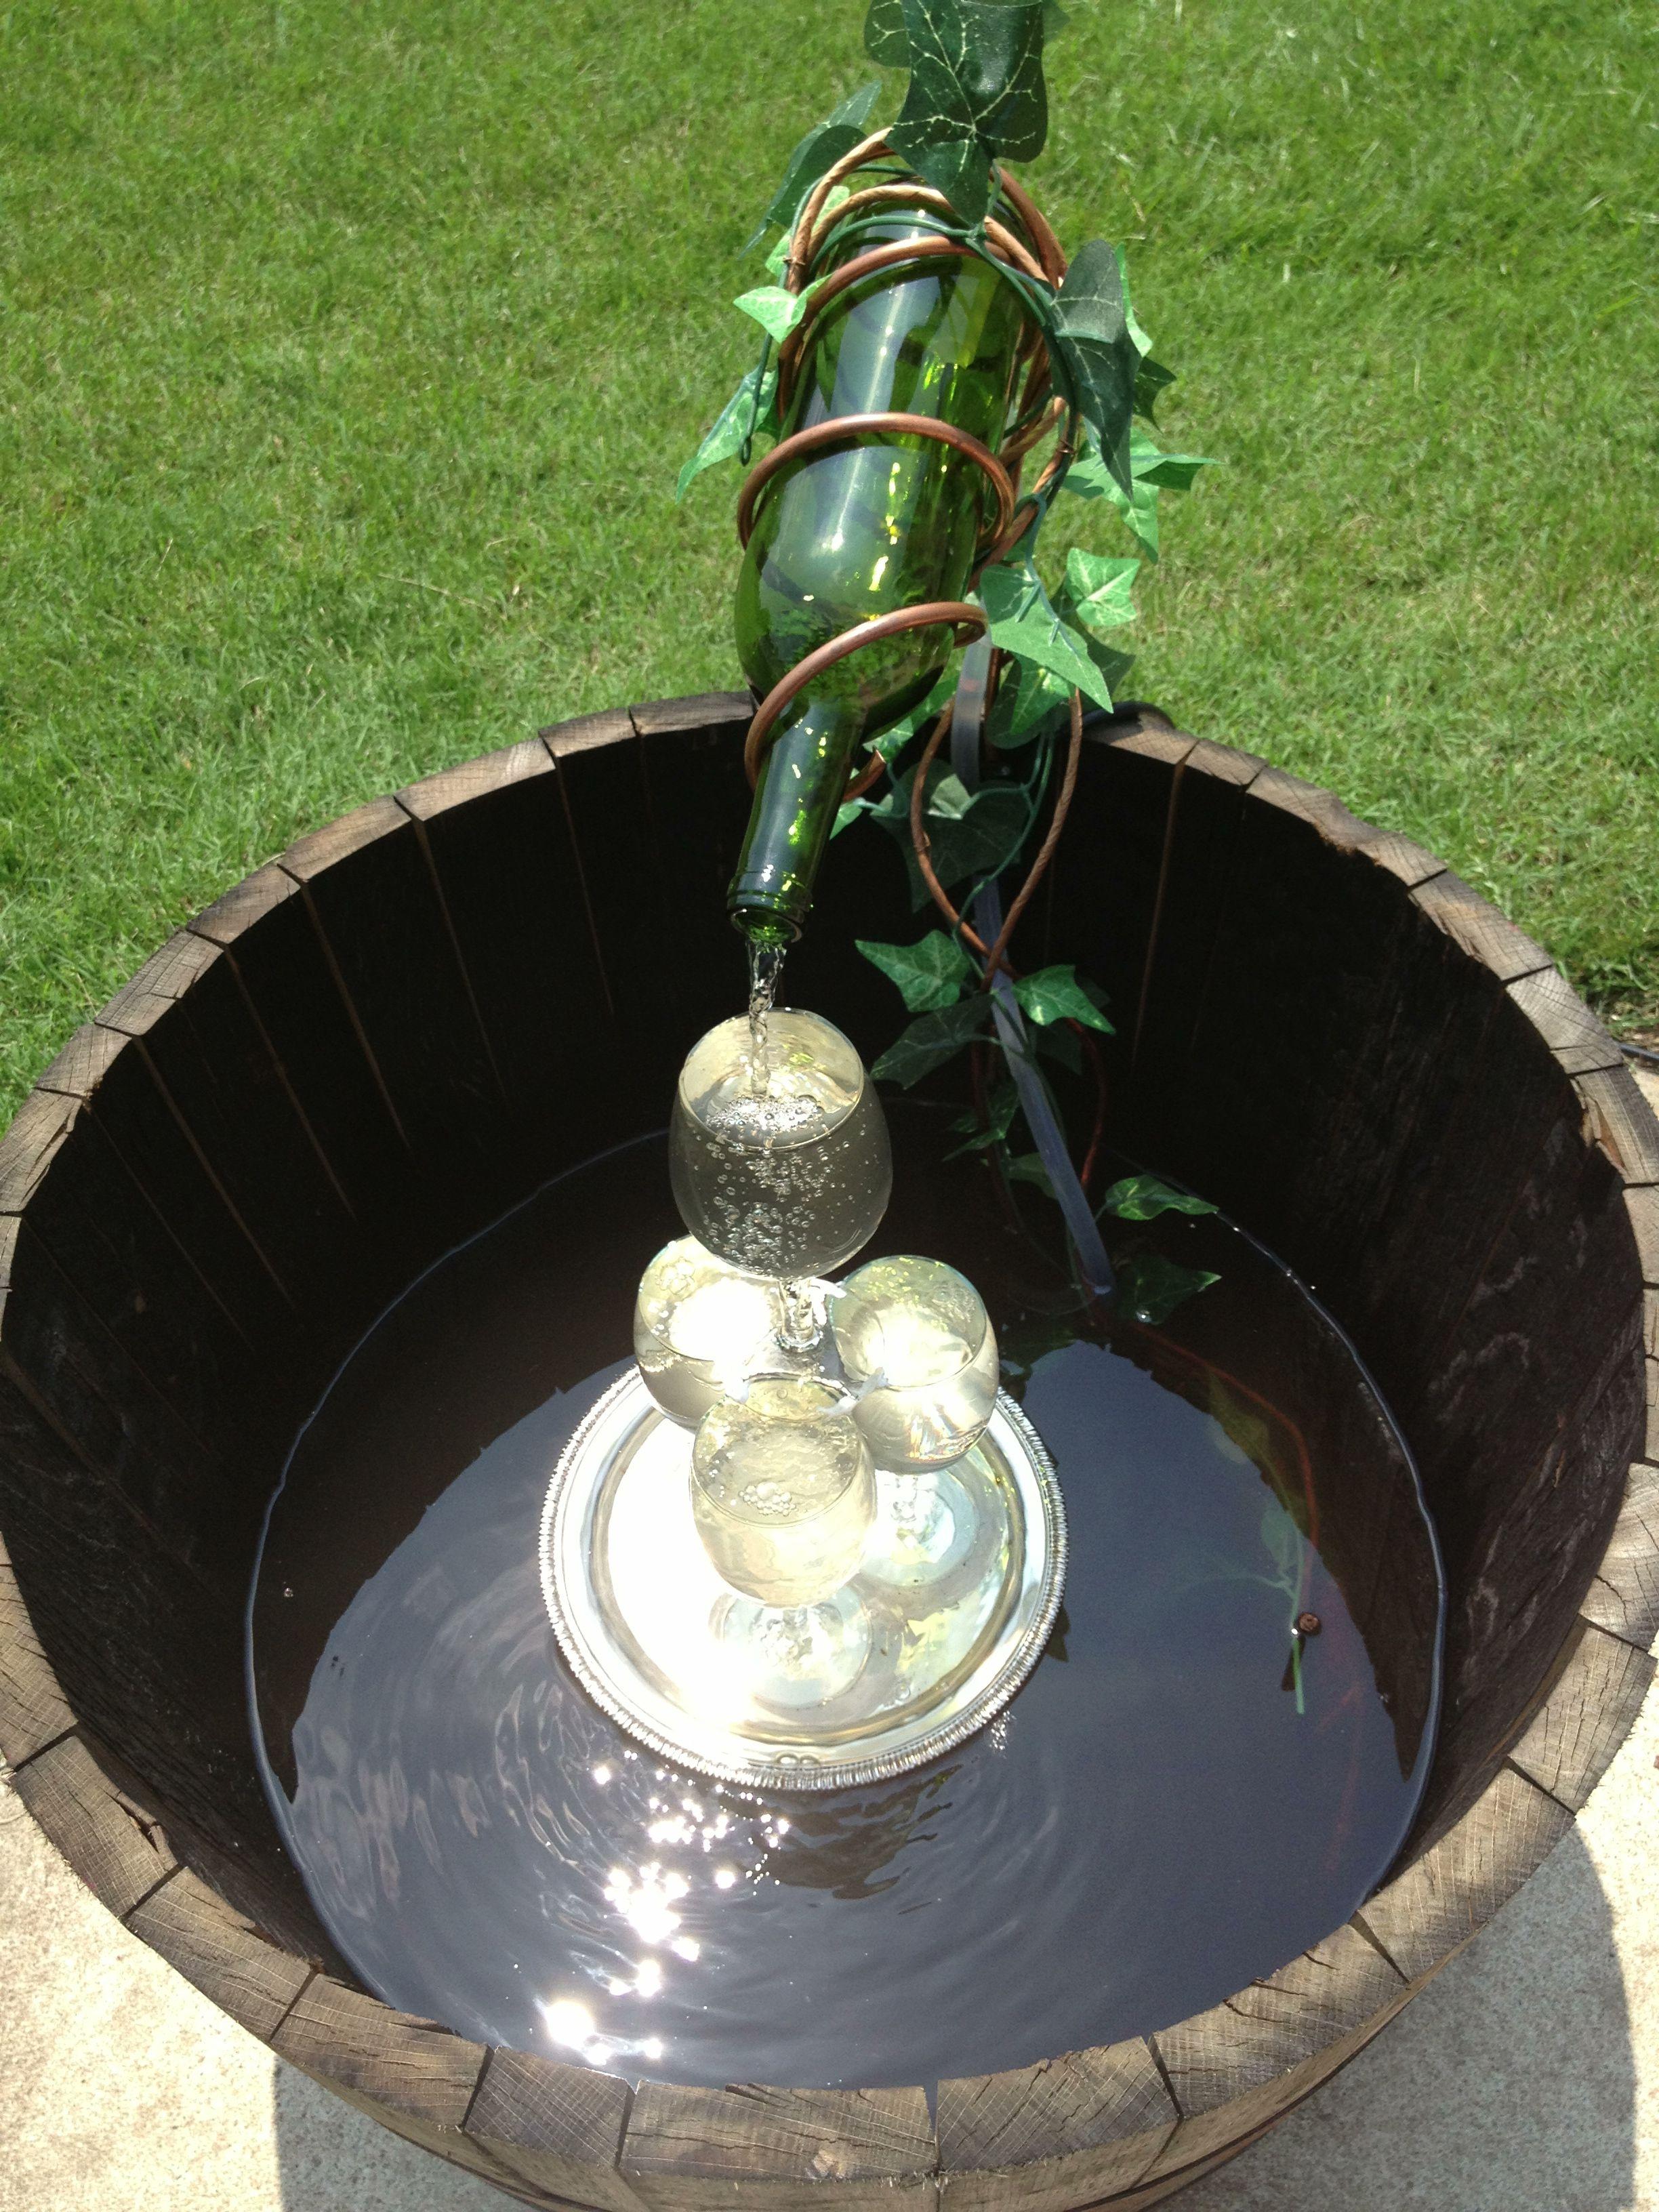 DIY wine barrel fountain | Craft Ideas | Pinterest ...